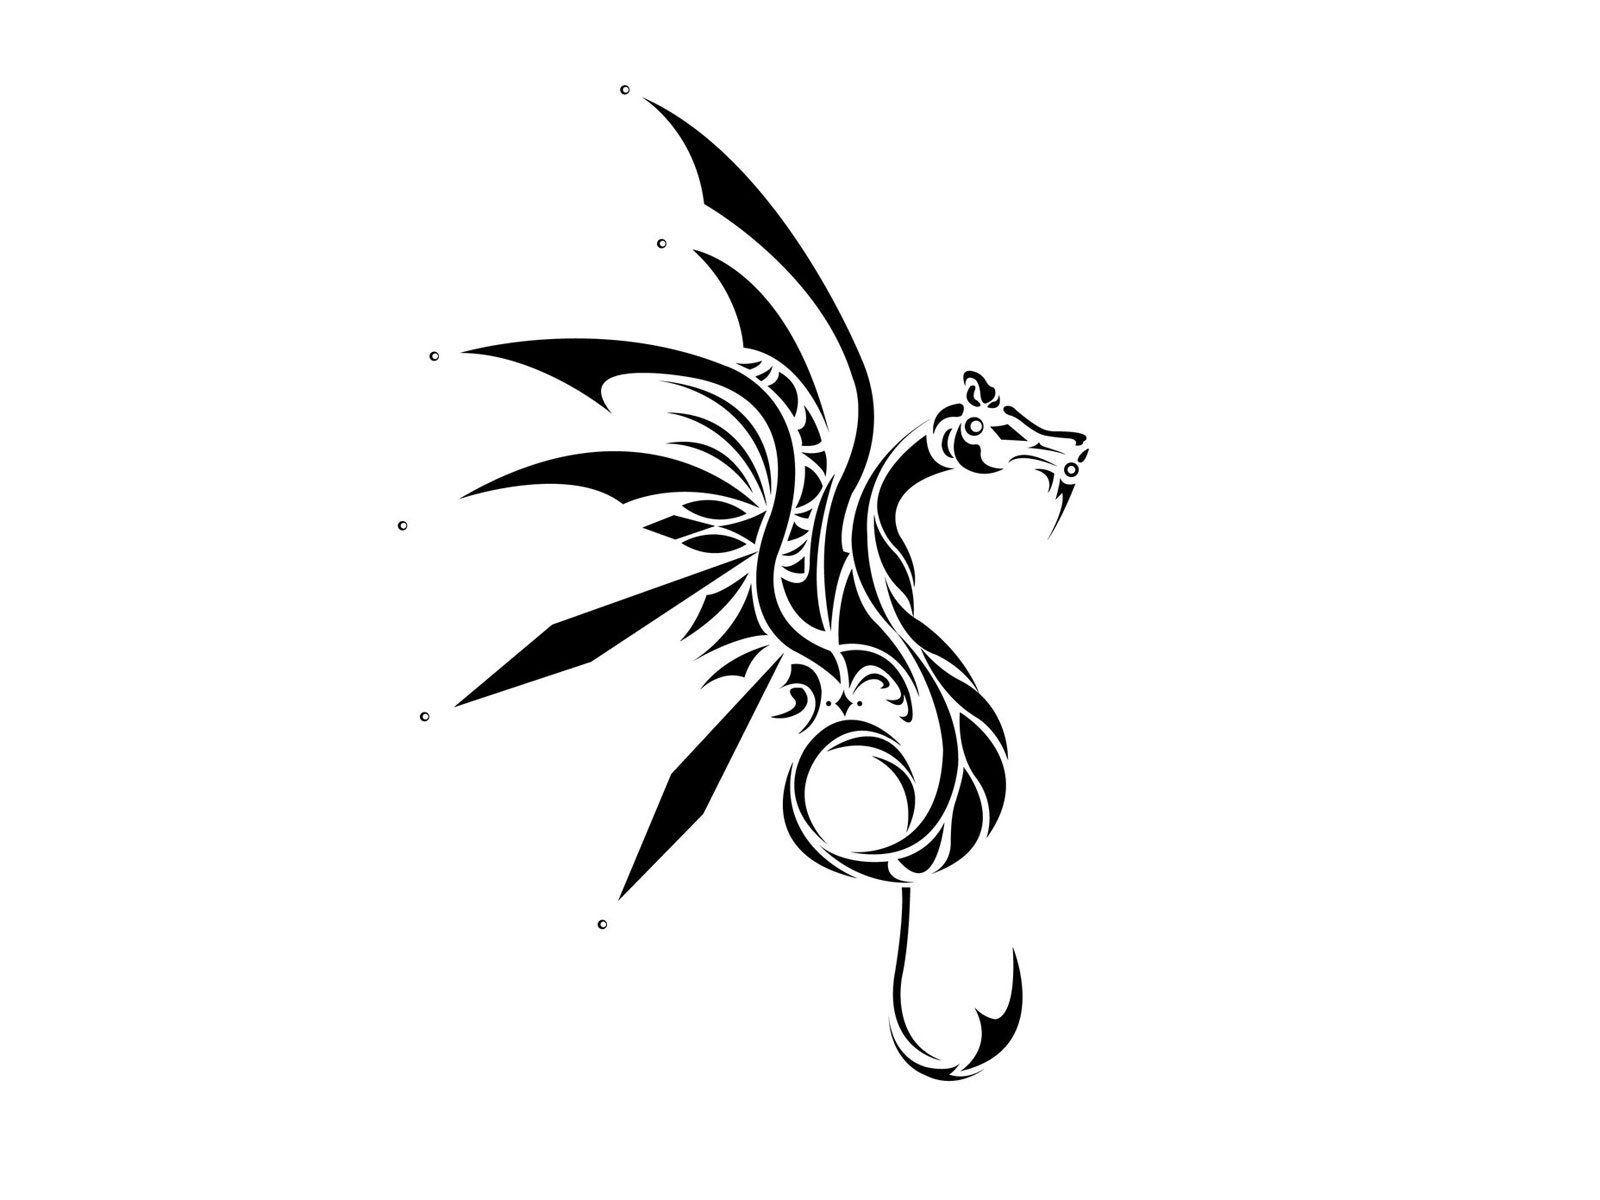 Welsh dragon tattoo designs - World Of Warcraft Tattoos Google Search Small Dragon